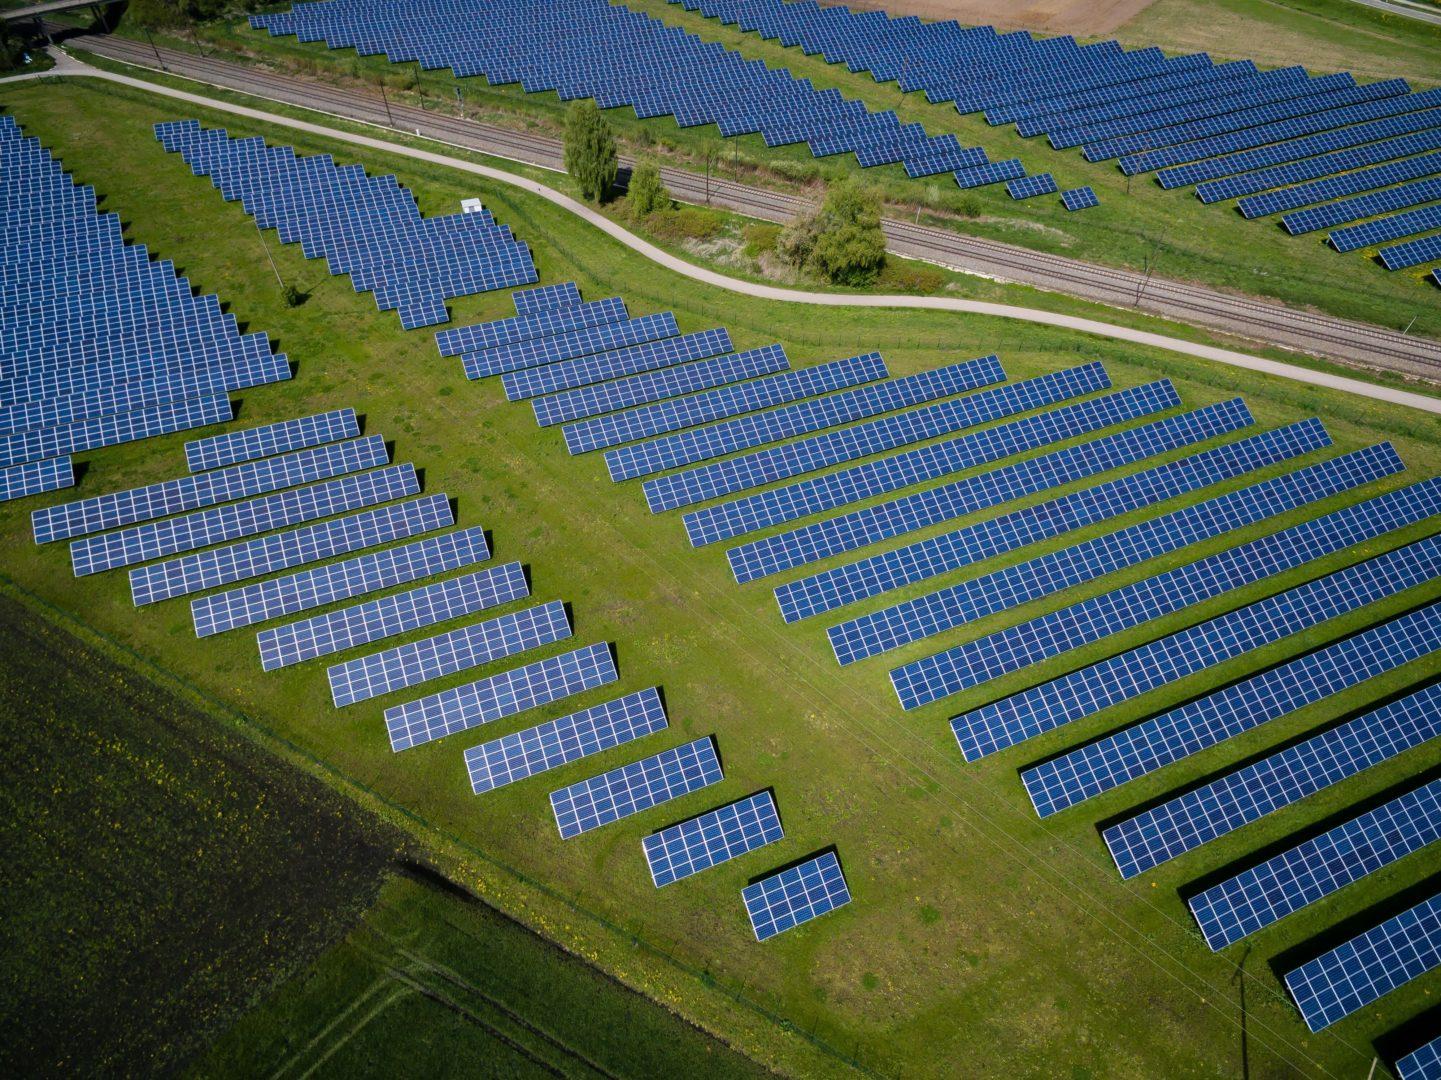 Luftbildaufnahme Solarpark XY